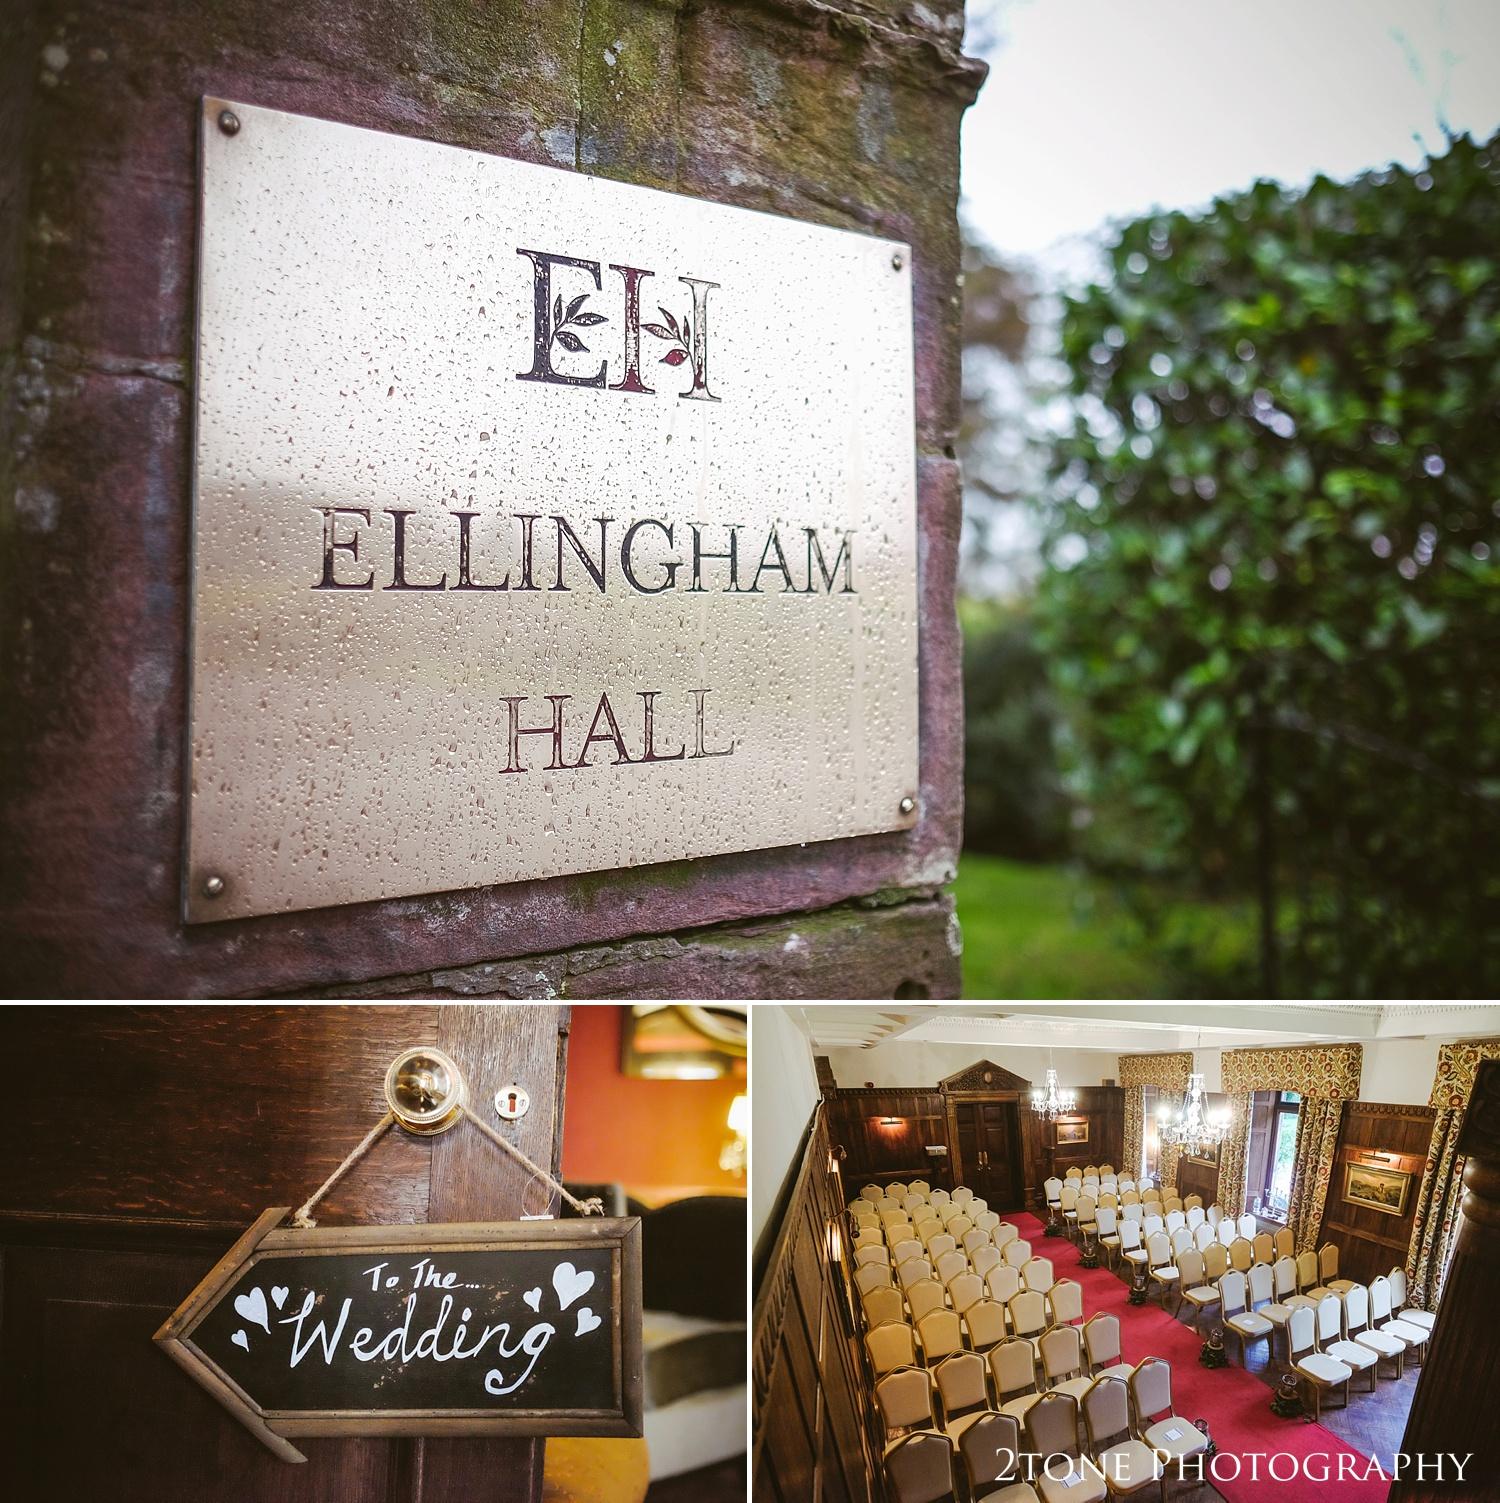 Ellingham Hall winter wedding photography by www.2tonephotography.co.uk